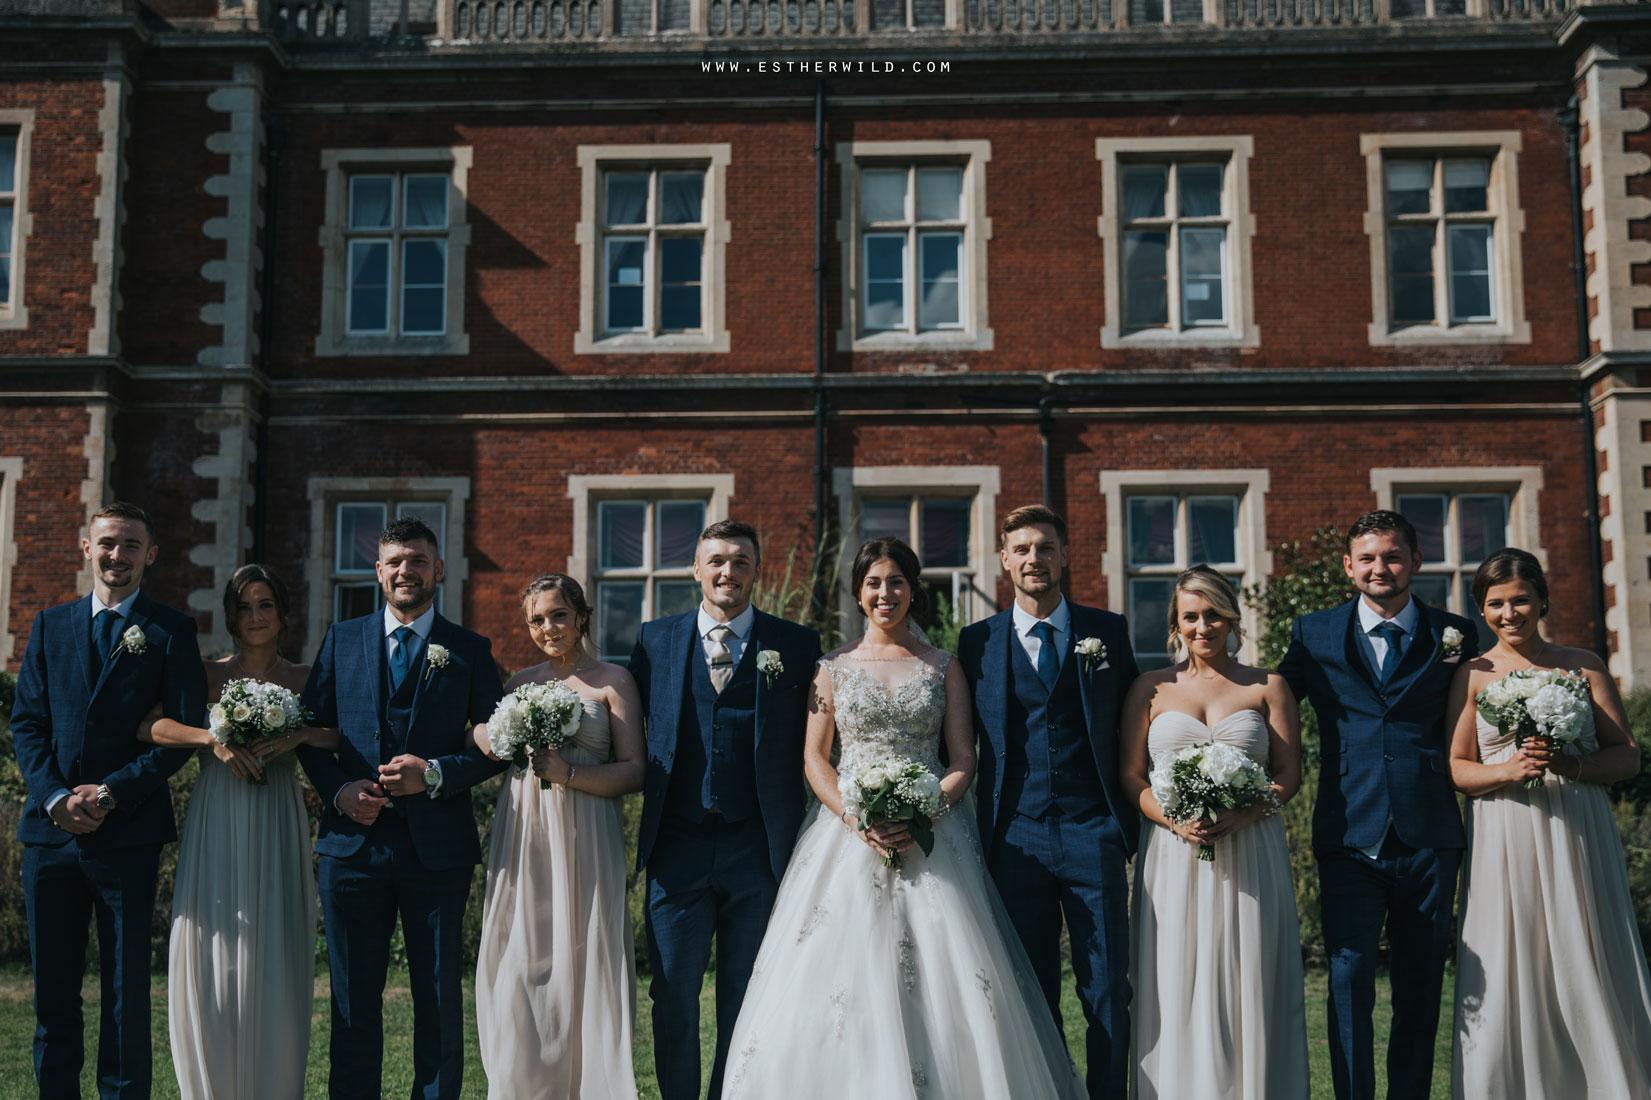 Lynford_Hall_Wedding_Thetford_Mundford_Esther_Wild_Photographer_IMG_1896.jpg